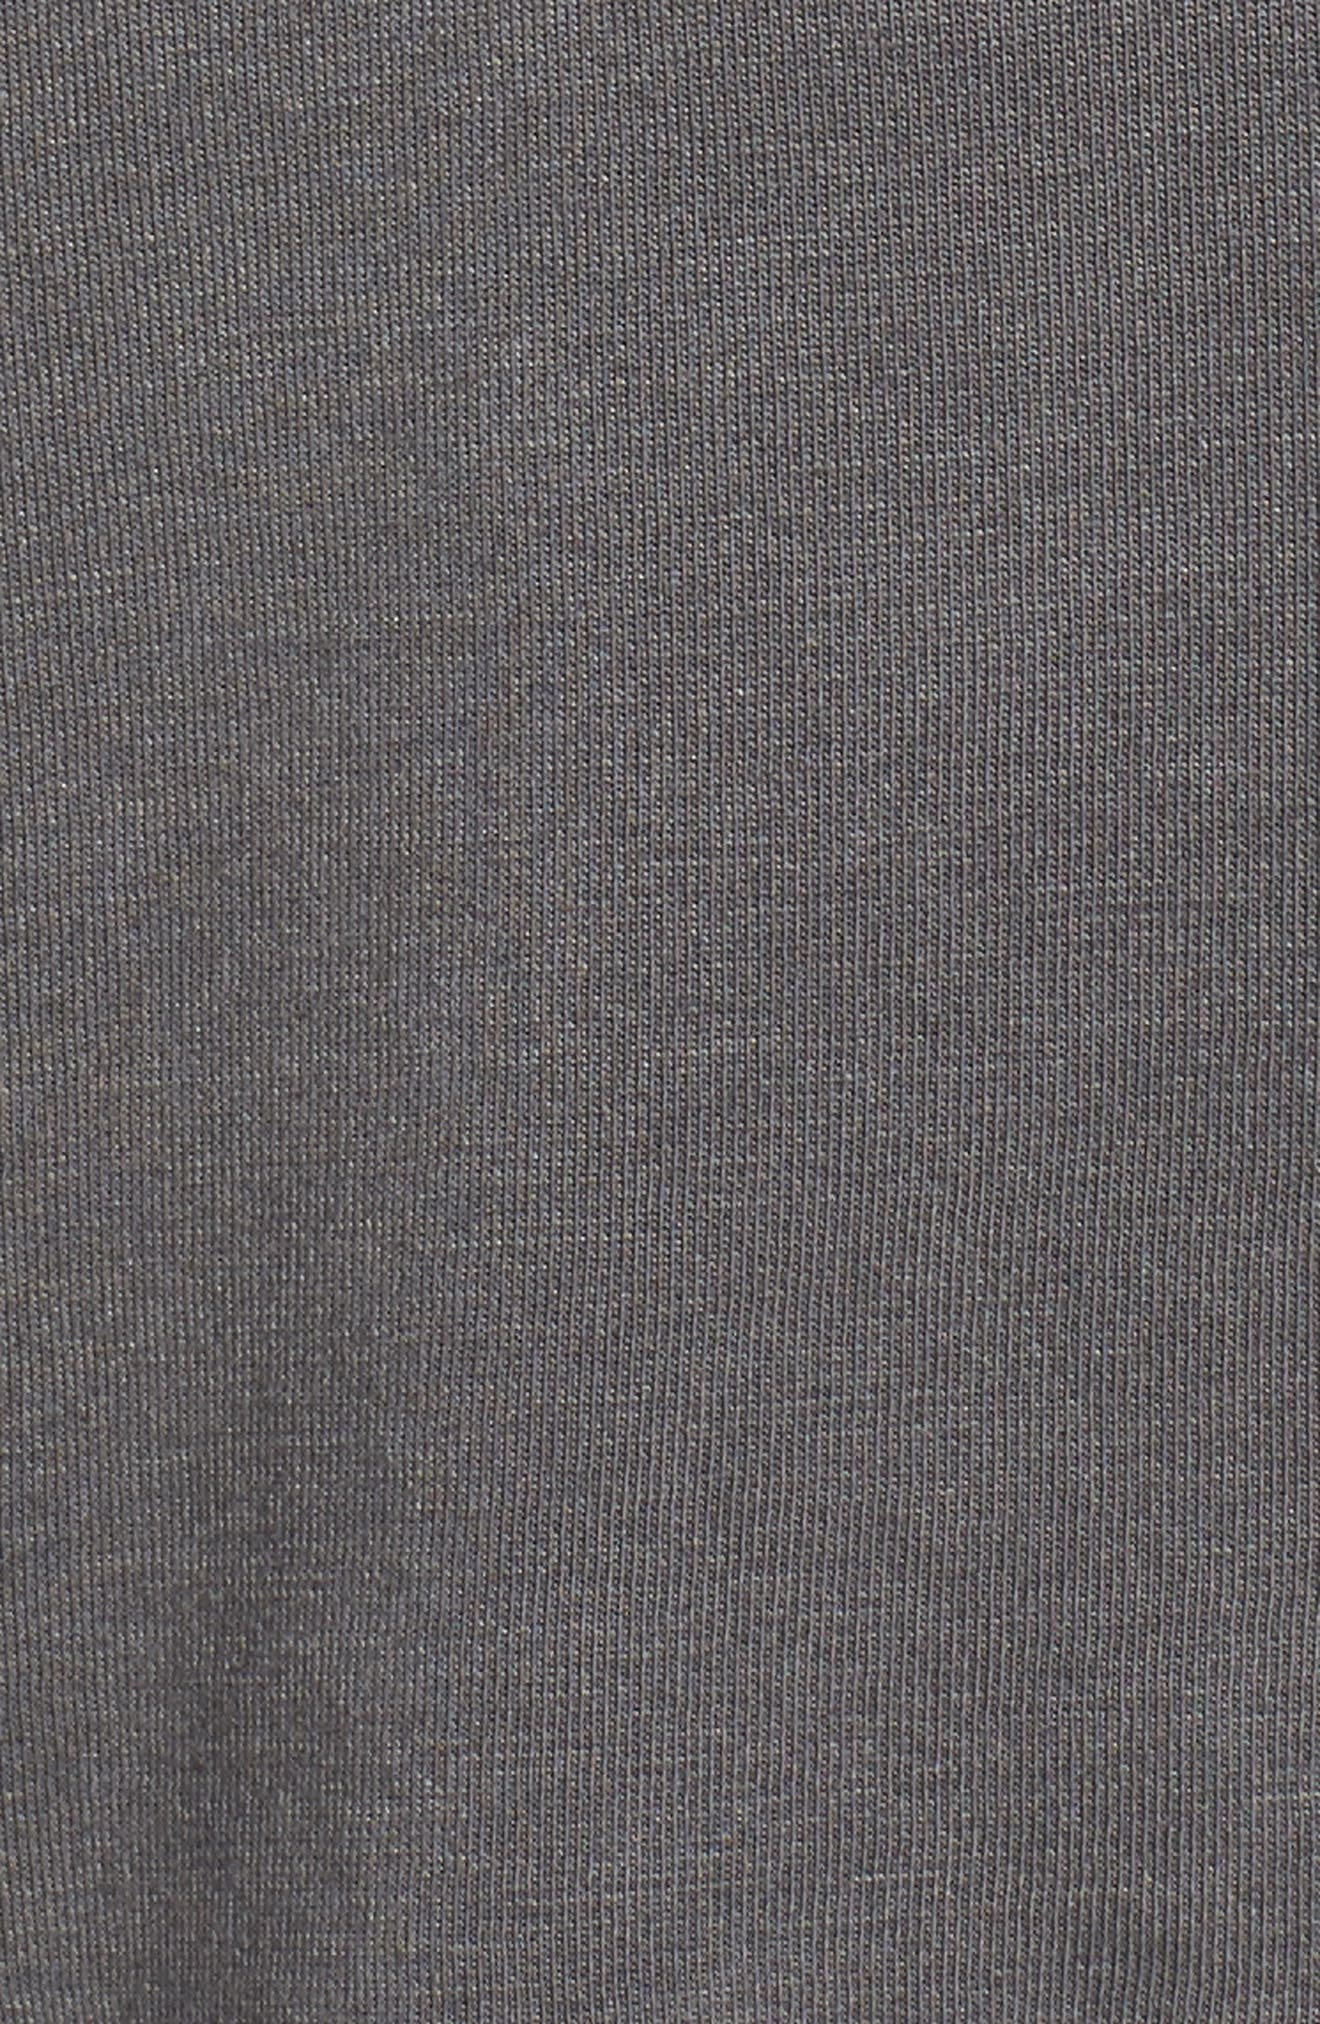 Strawberry Fields Sweatshirt,                             Alternate thumbnail 6, color,                             004